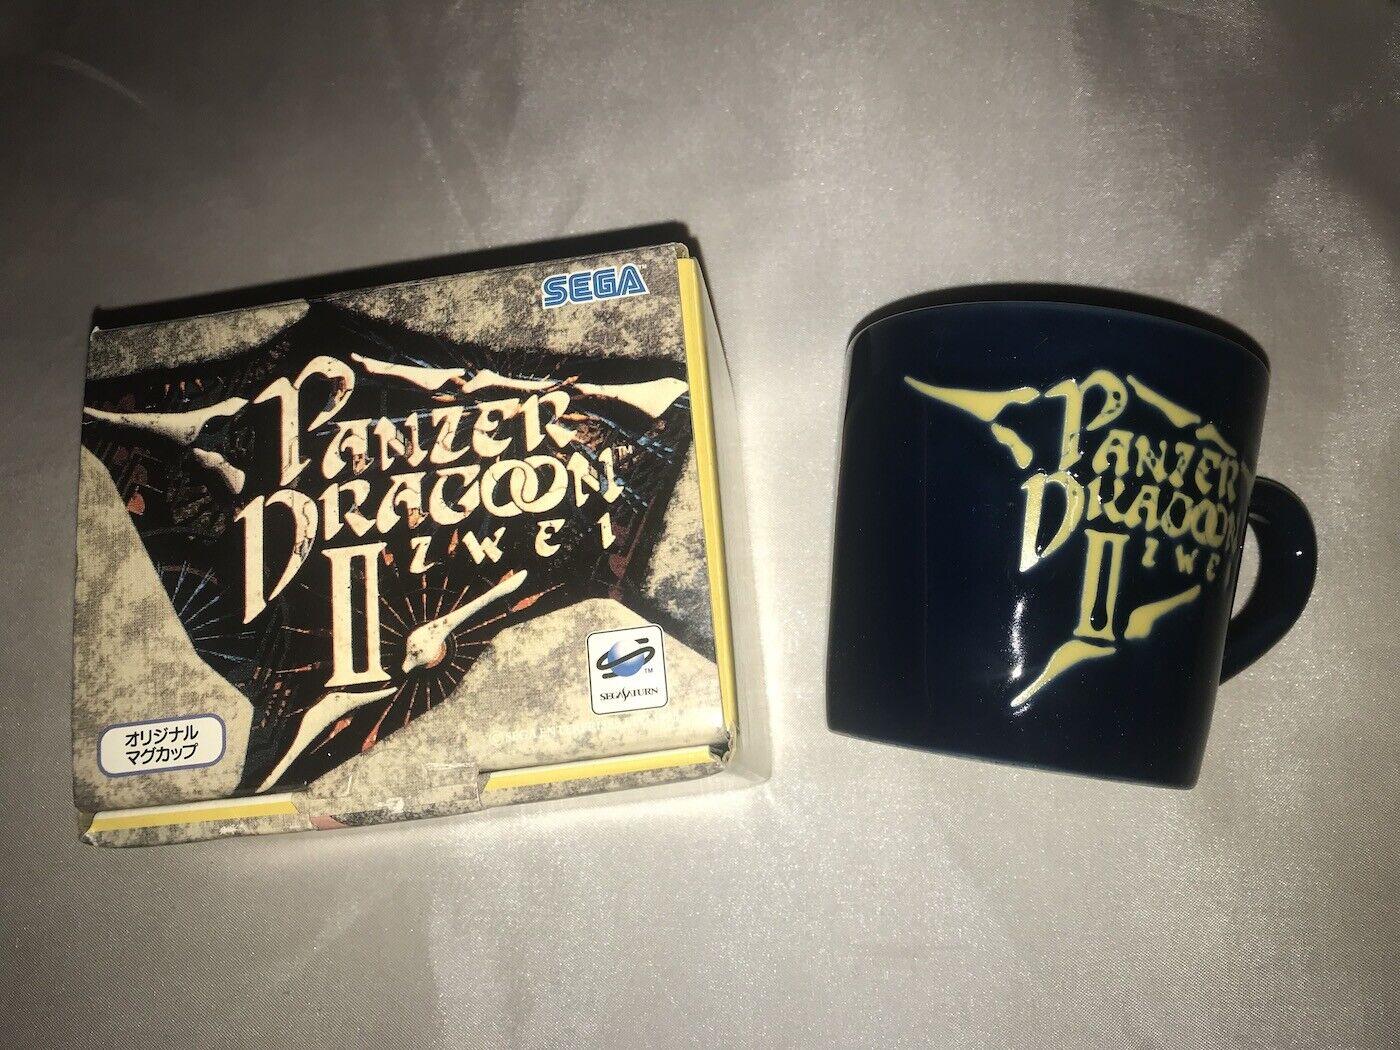 PANZER DRAGOON II ZWEI Promo SEGA SATURN MUG  CUP Japan Jap Jp NOT FOR SALE Rare  Commandez maintenant